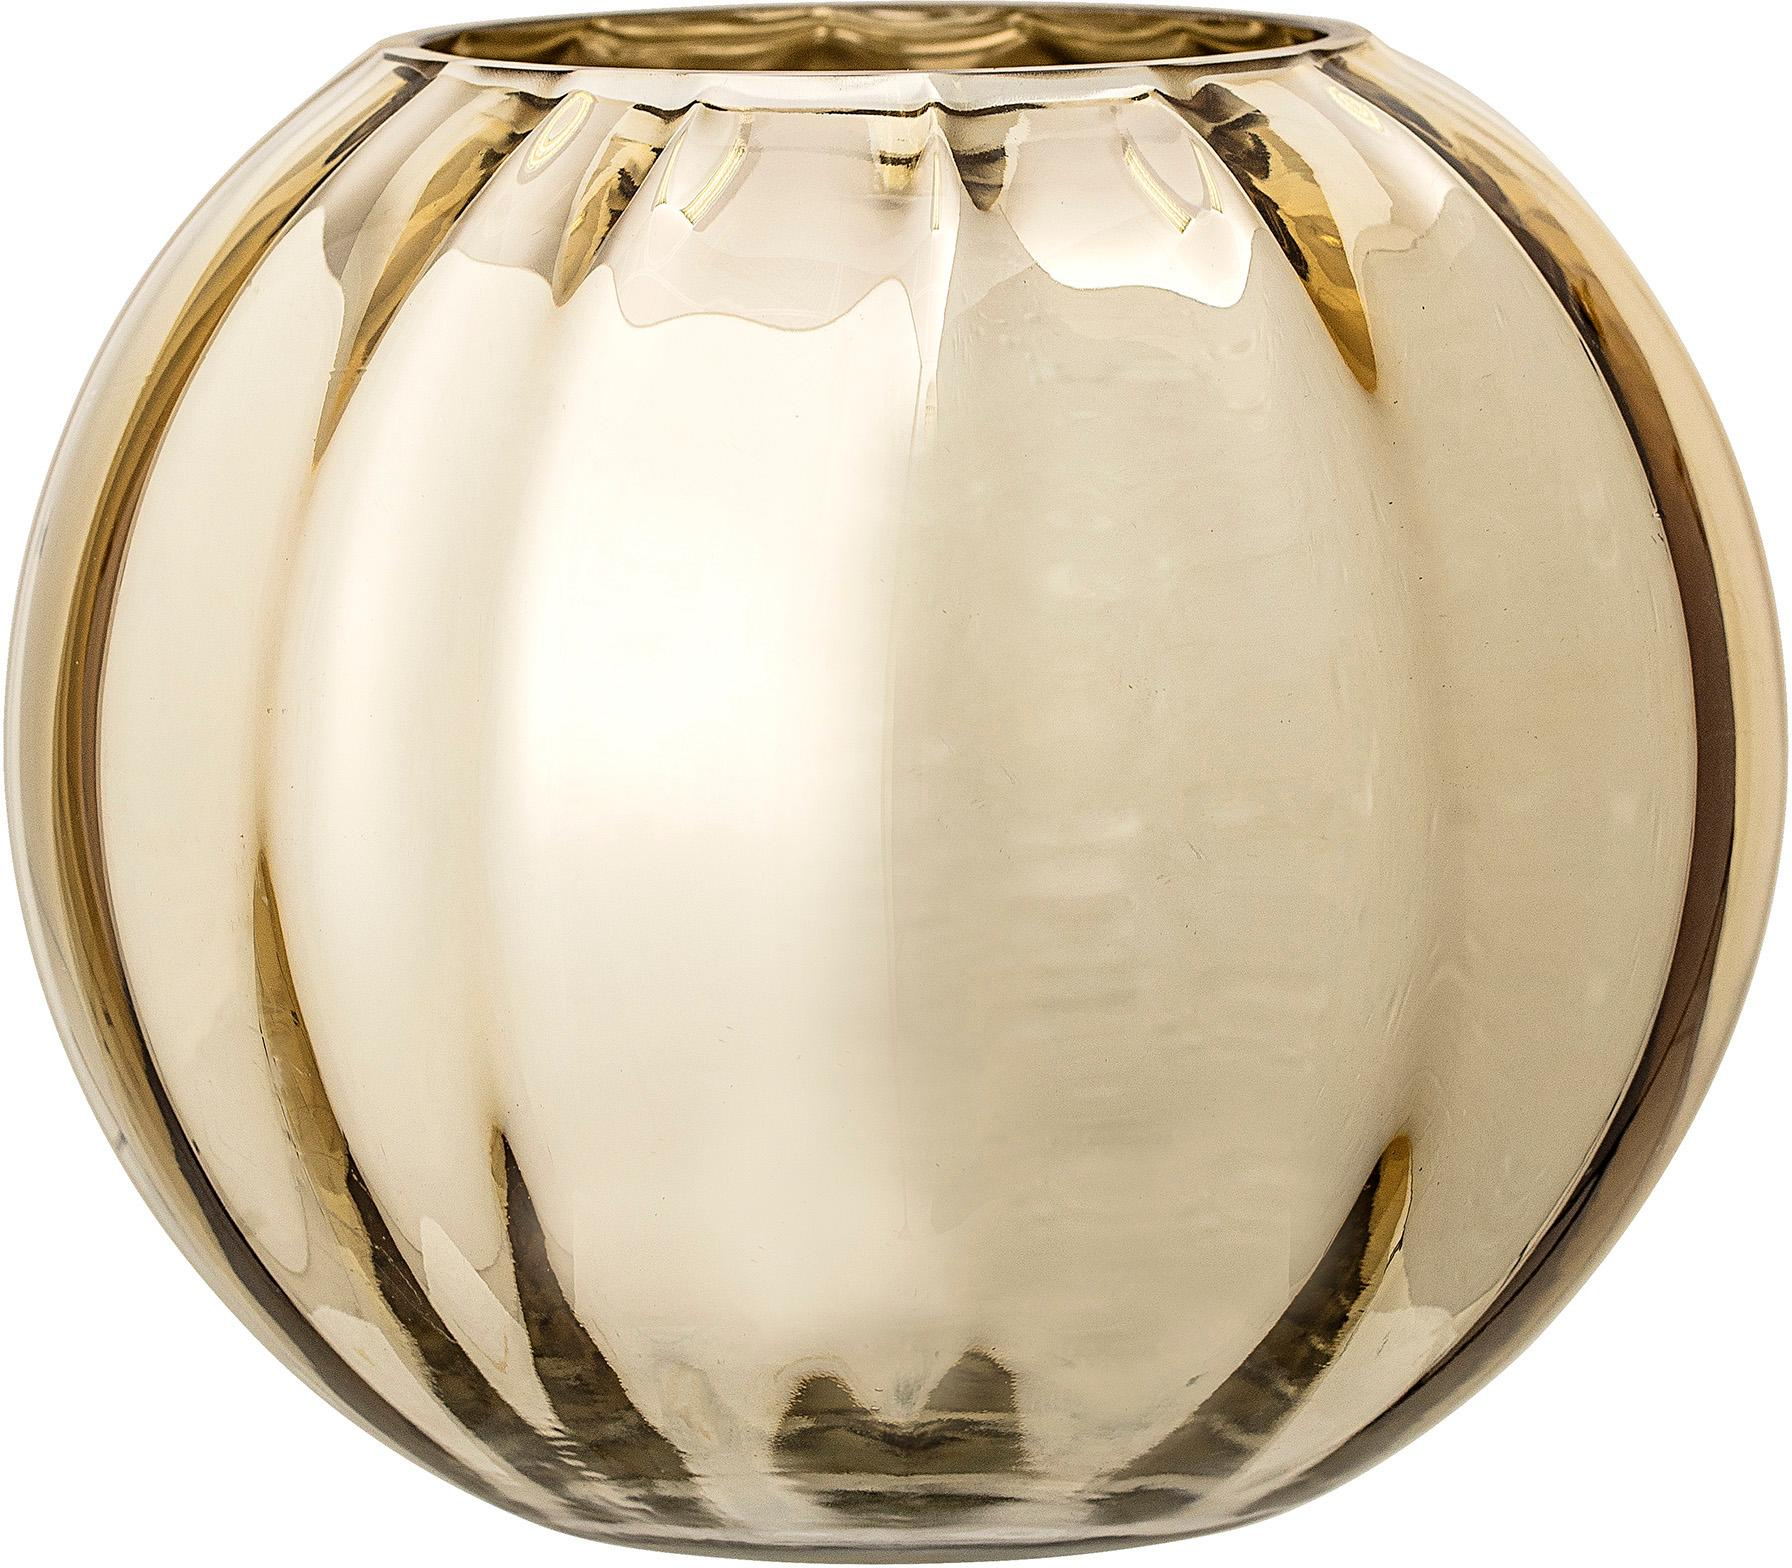 Kleine glazen vaas Viola, goudkleurig, Glas, Goudkleurig, Ø 18 x H 15 cm